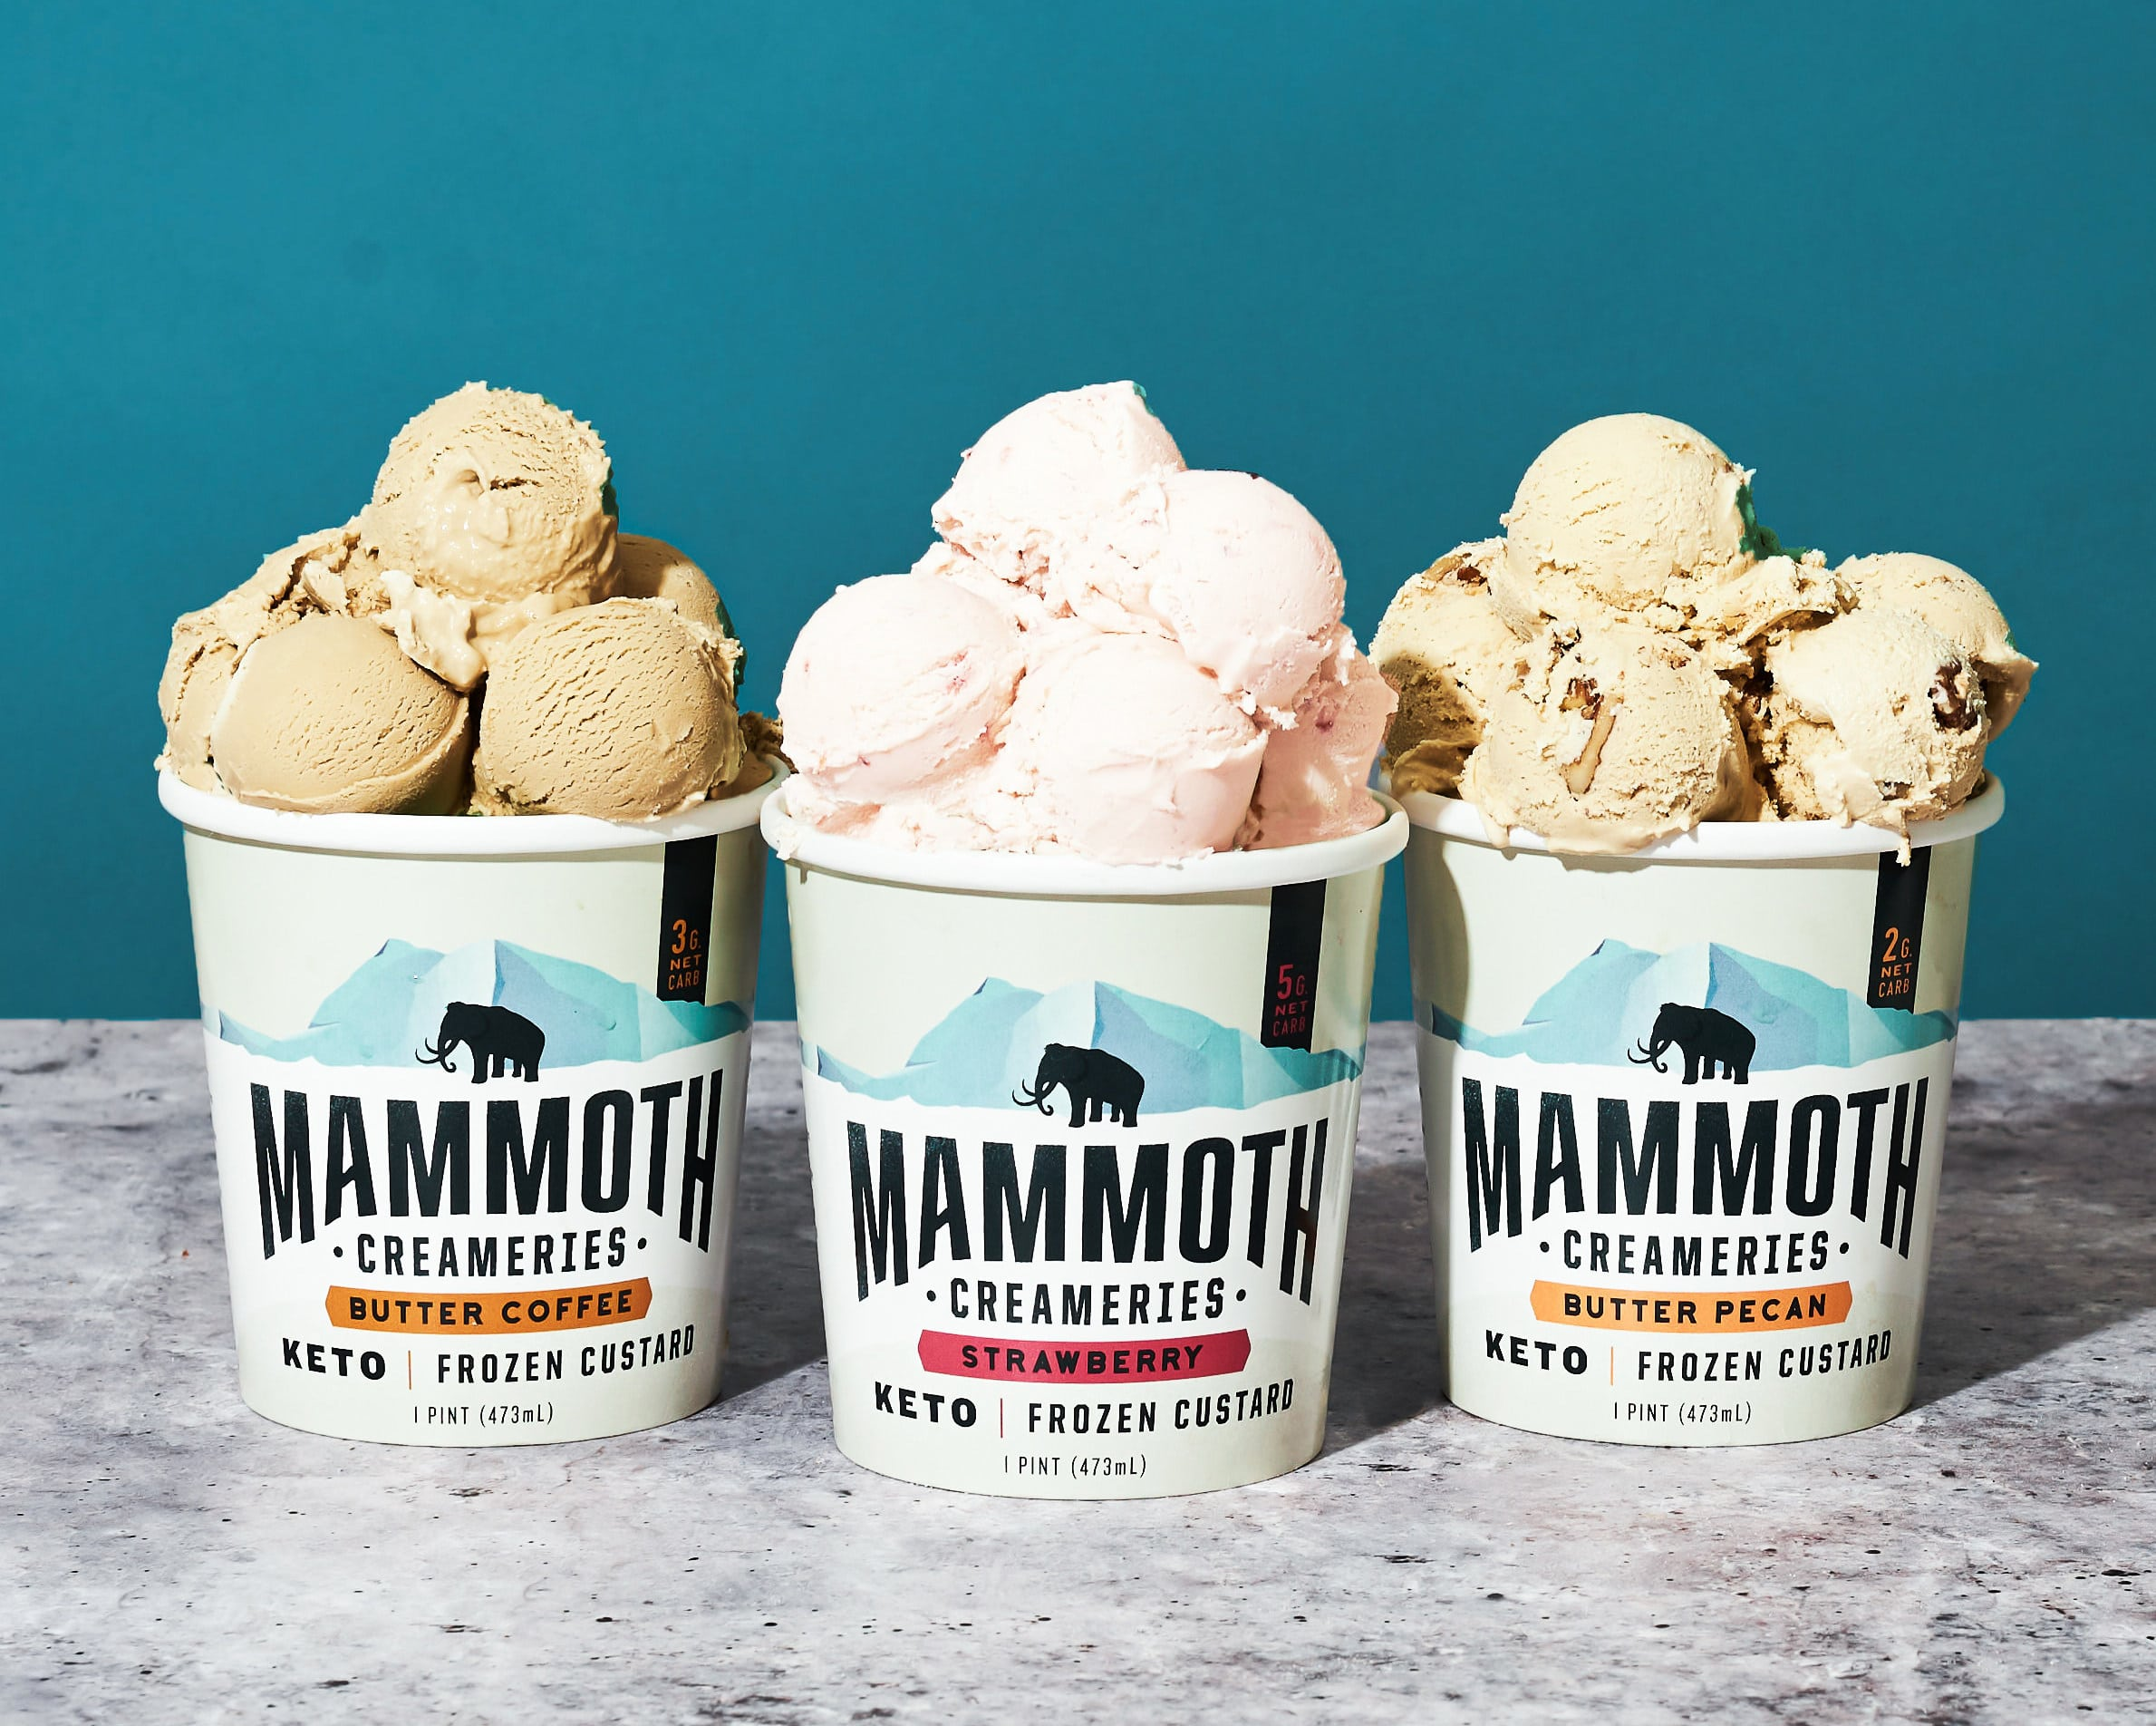 Keto Frozen Custard Brand Mammoth Creameries Releases Three New Flavors